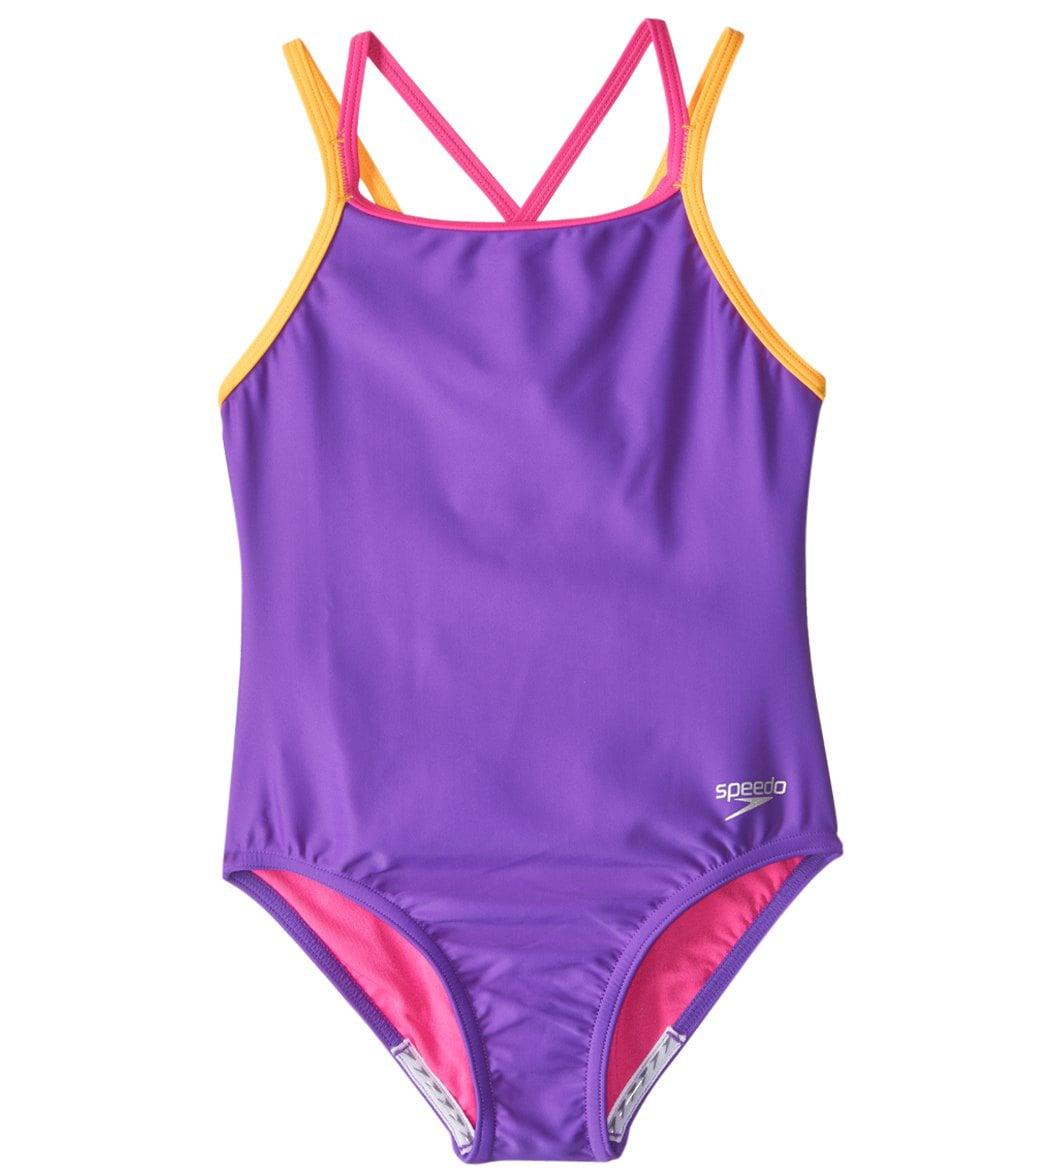 Girls' One Piece 7-16 Swimwear at SwimOutlet.com